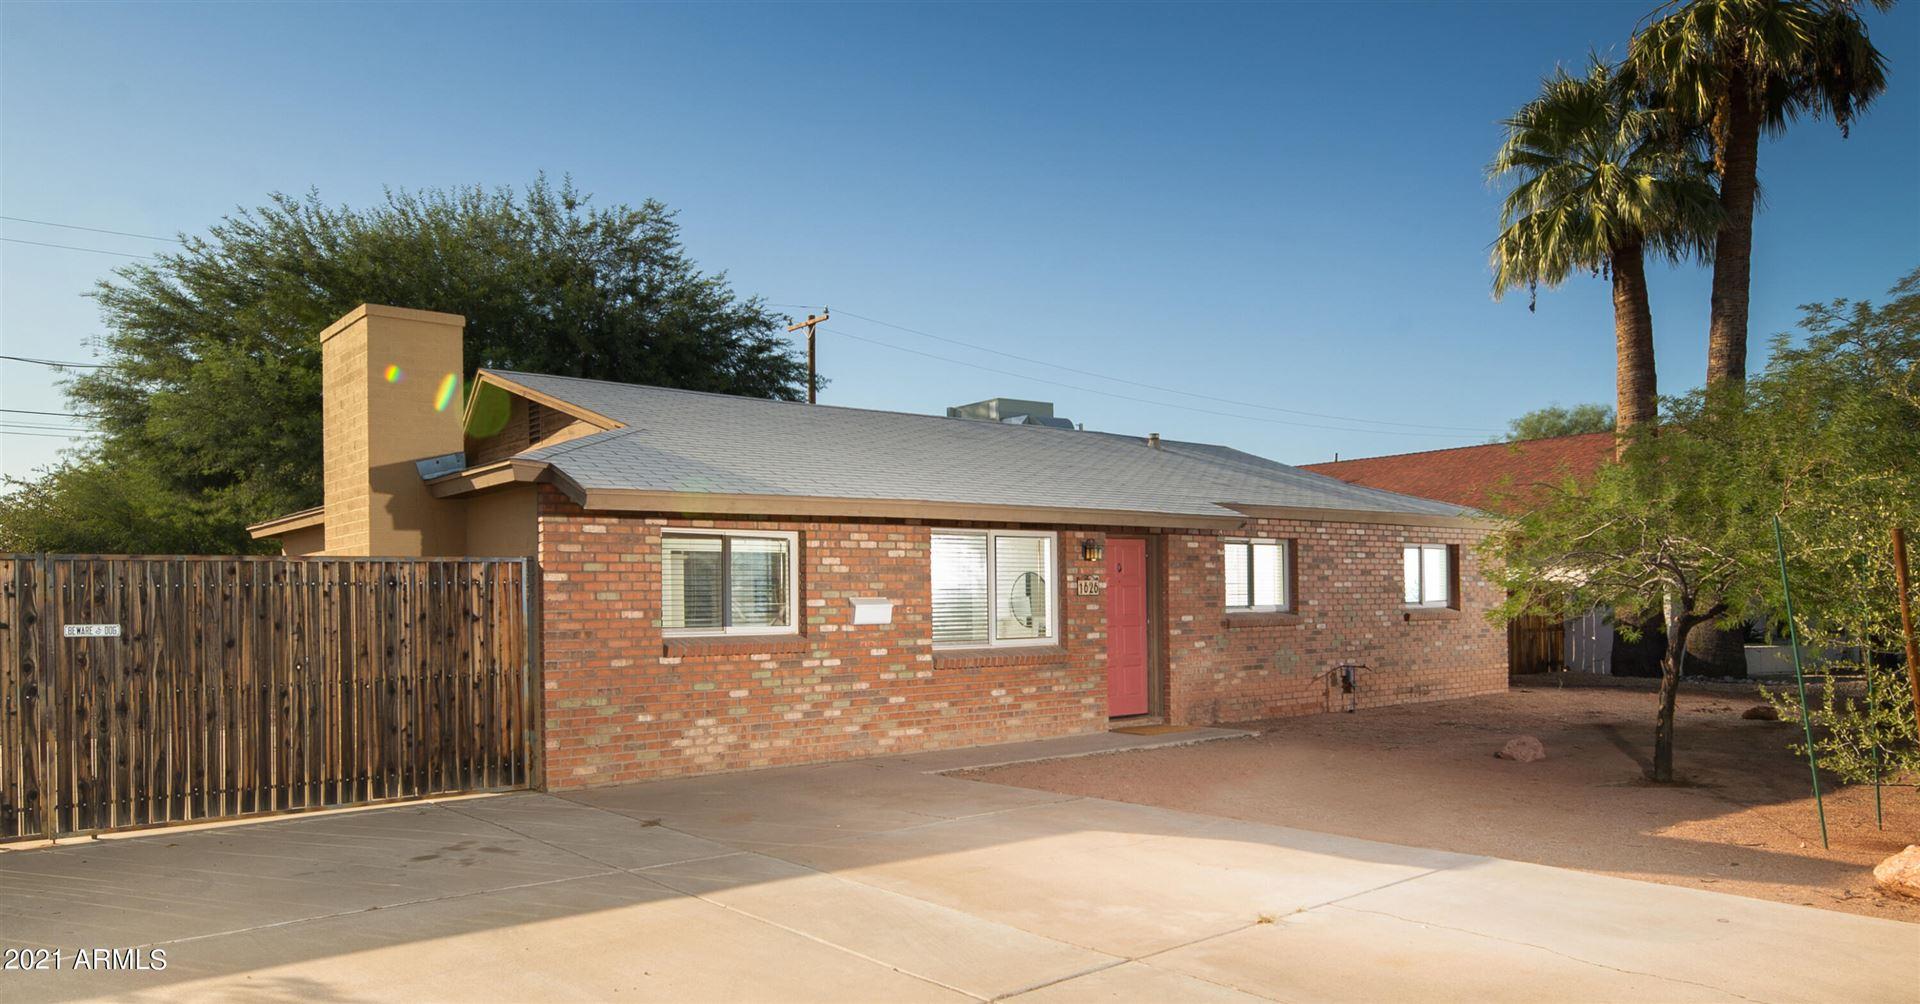 Photo of 1626 S MARILYN ANN Drive, Tempe, AZ 85281 (MLS # 6307503)